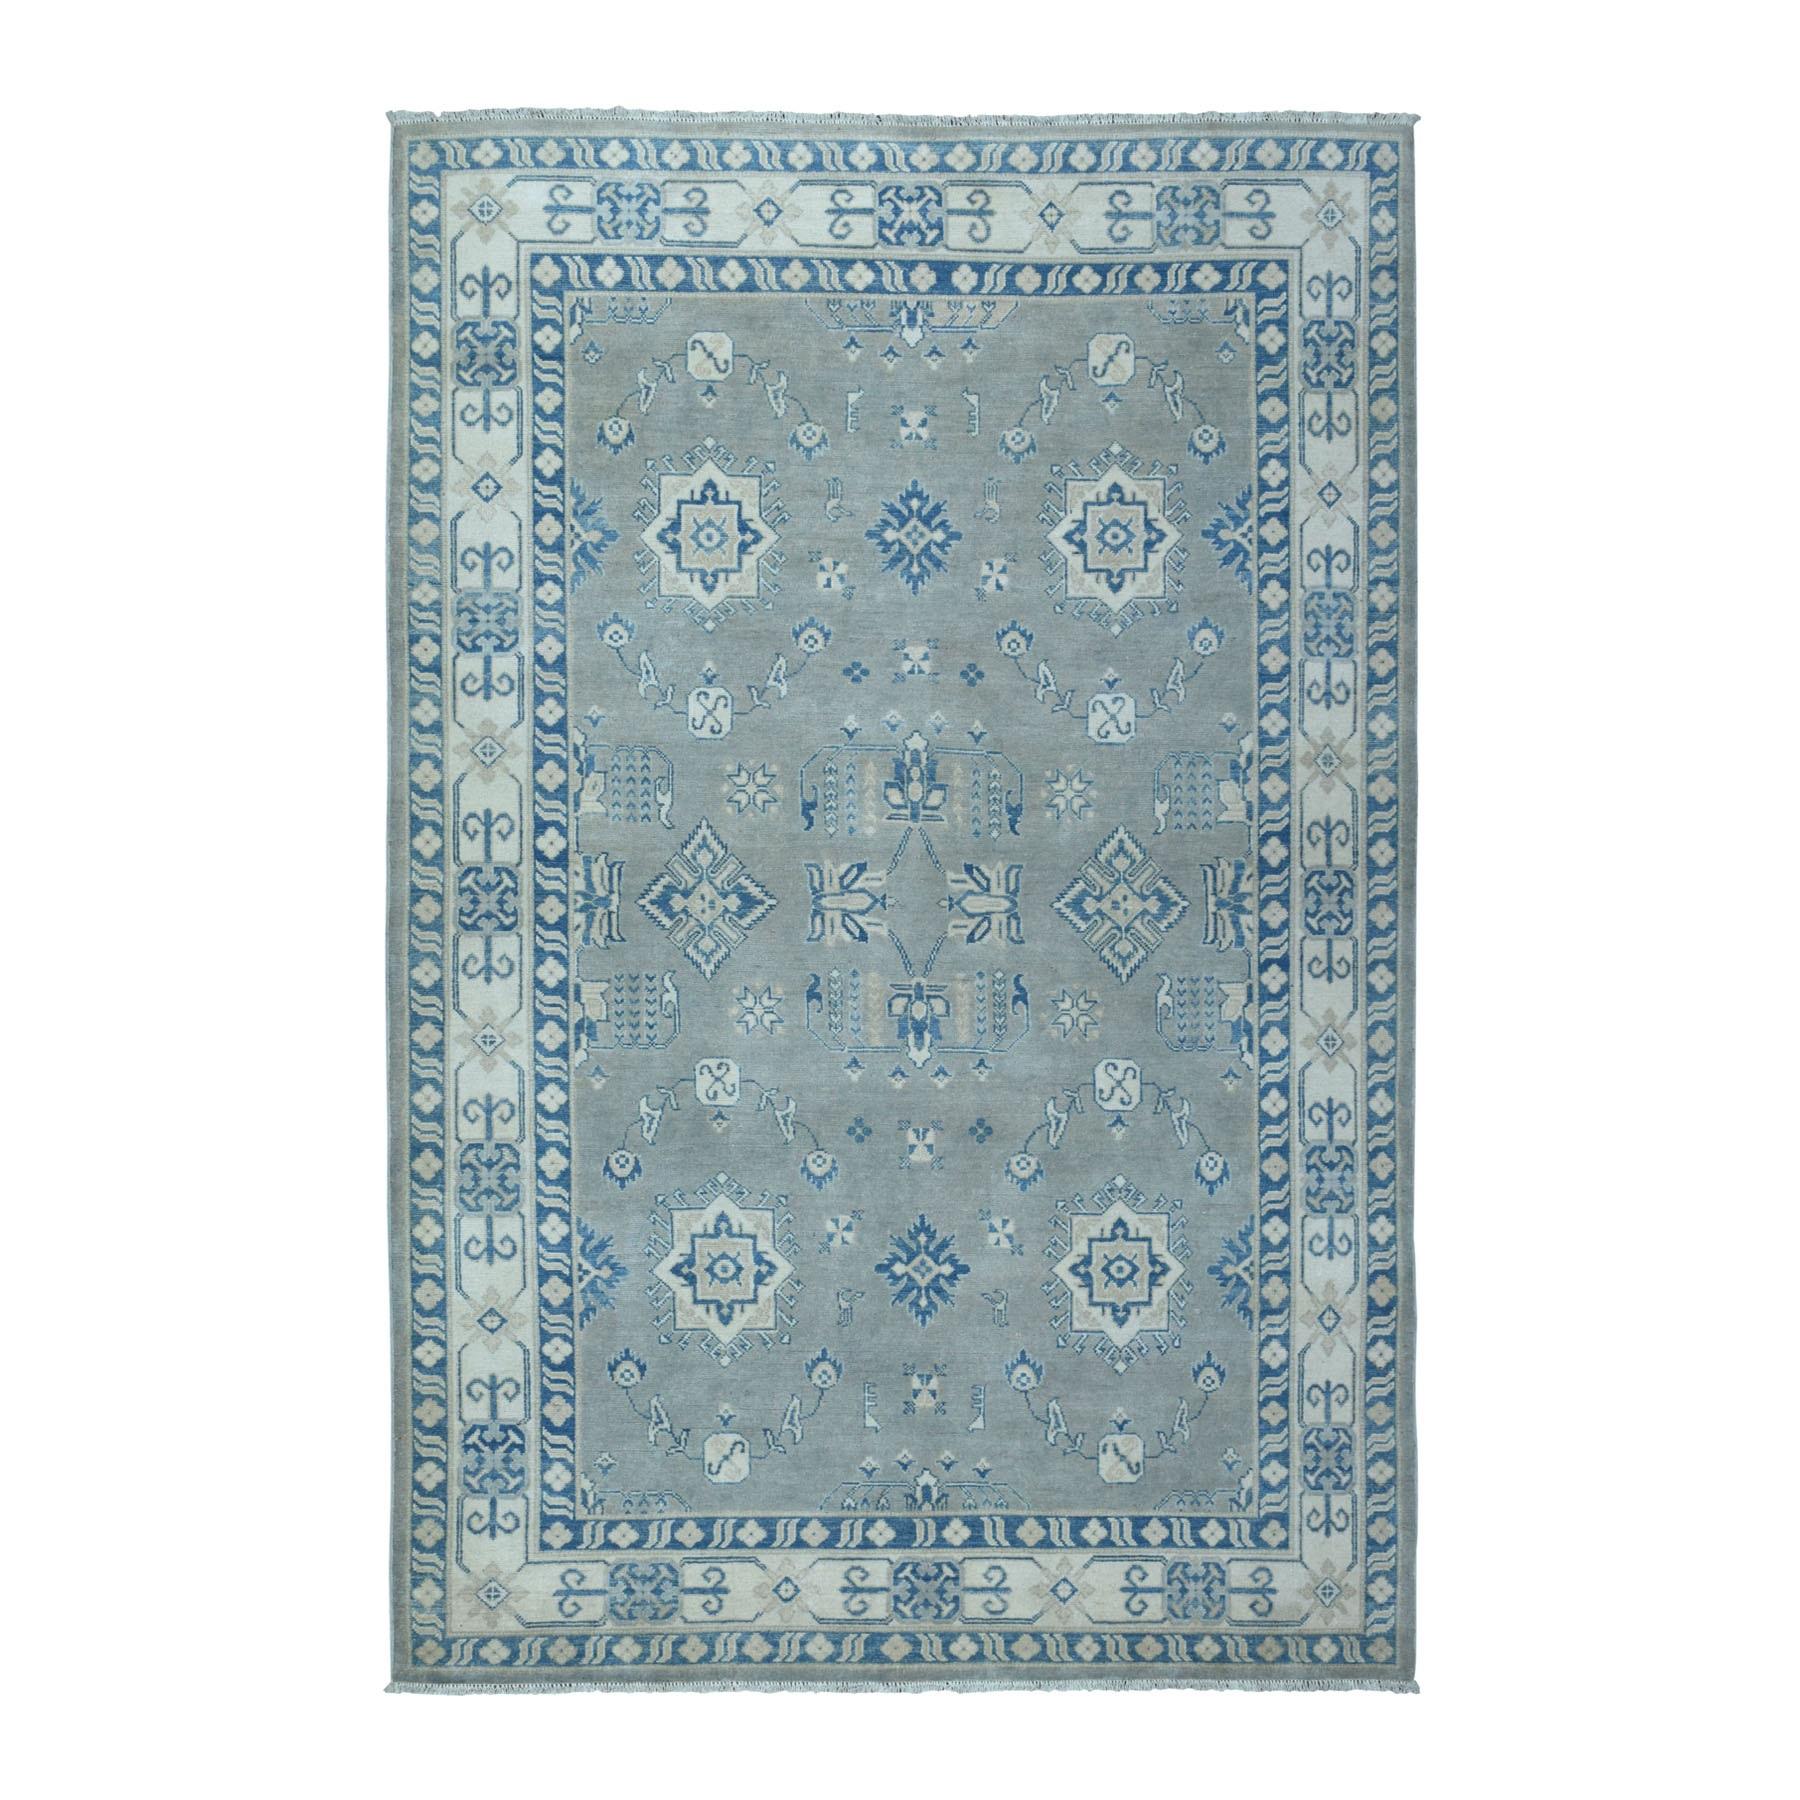 "5'9""x8'9"" Grey Vintage Look Kazak Geometric Design Pure Wool Hand Knotted Oriental Rug"